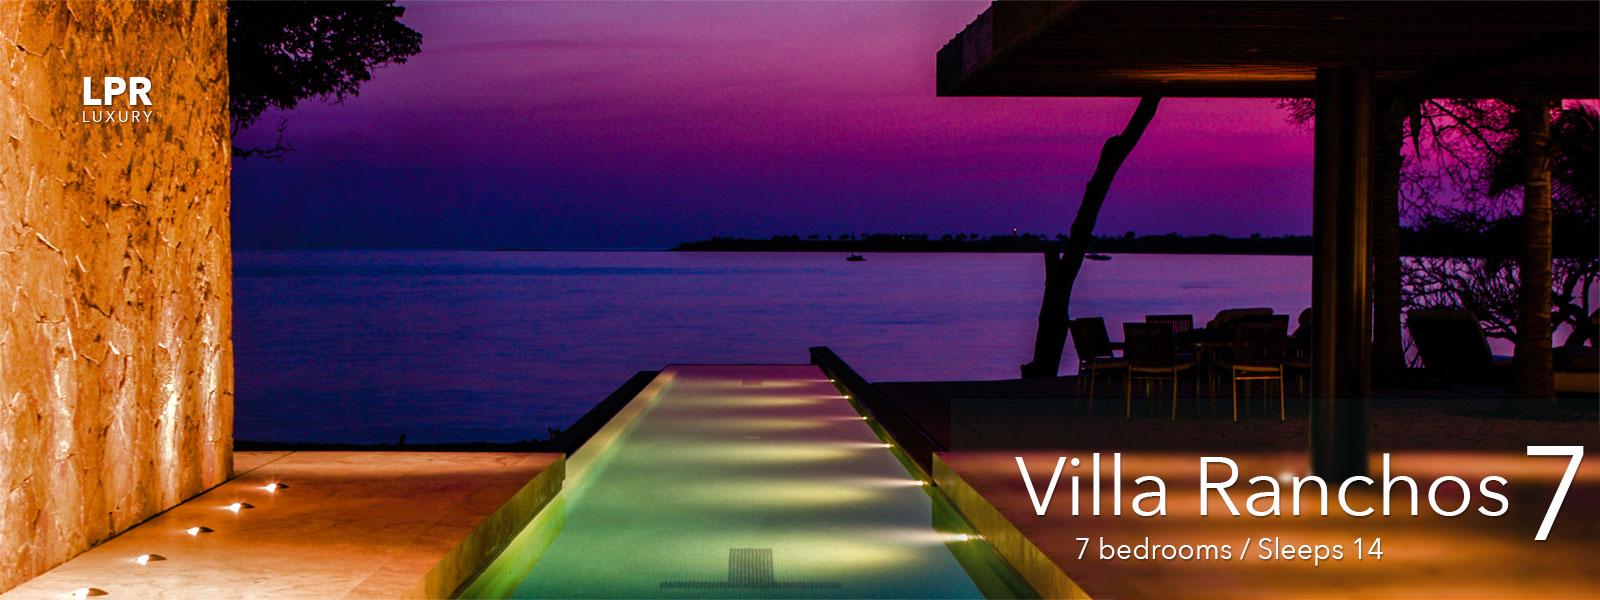 Villa Ranchos 7 - Punta Mita Resort - Riviera Nayarit, Mexico